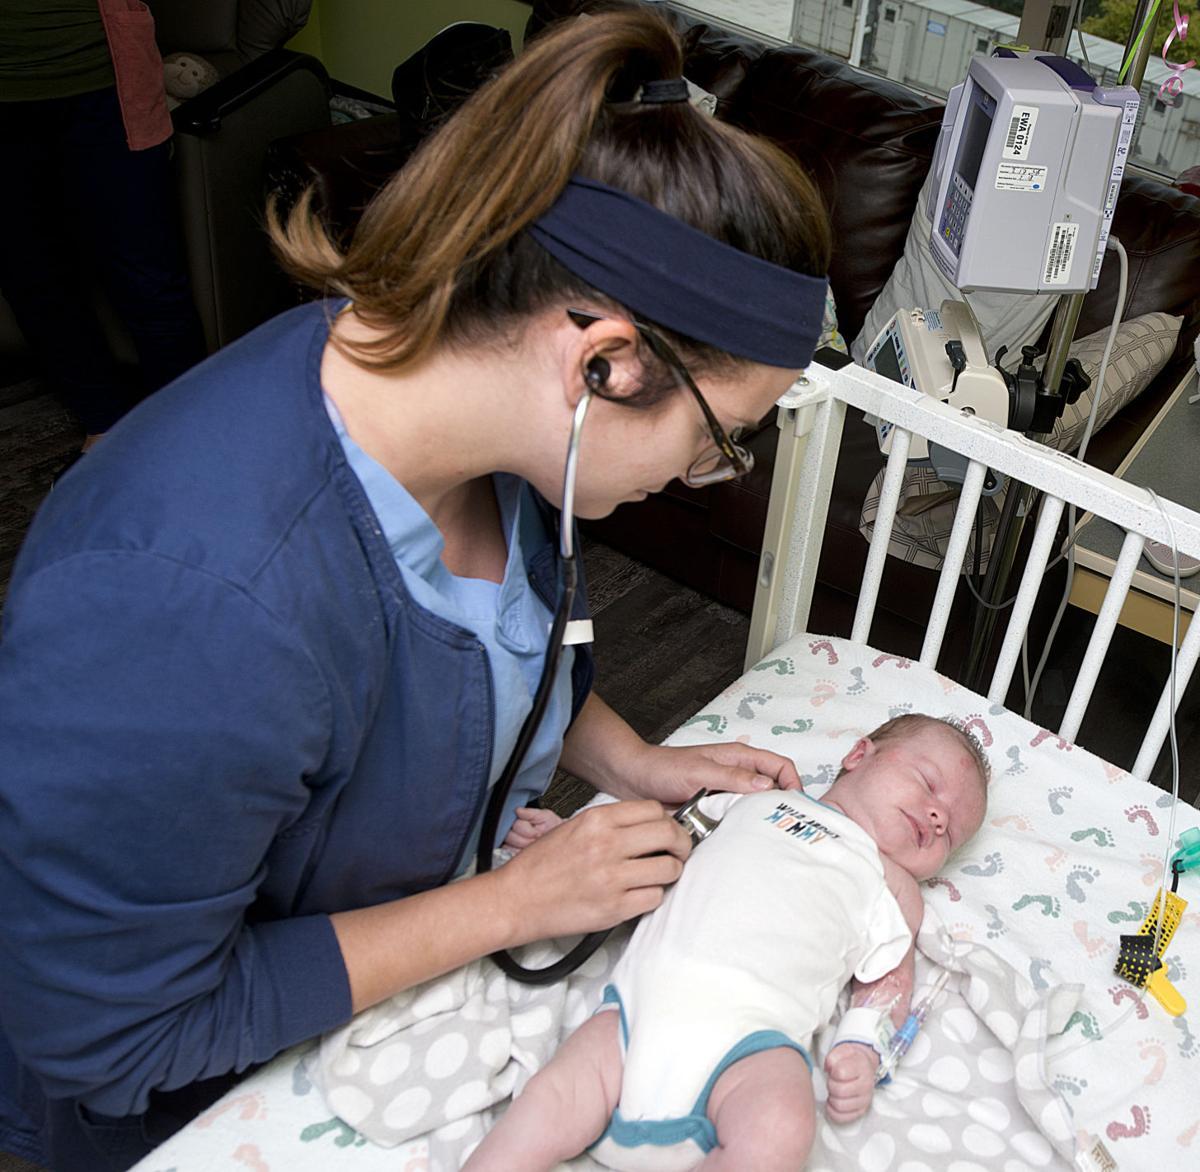 Newborn illness